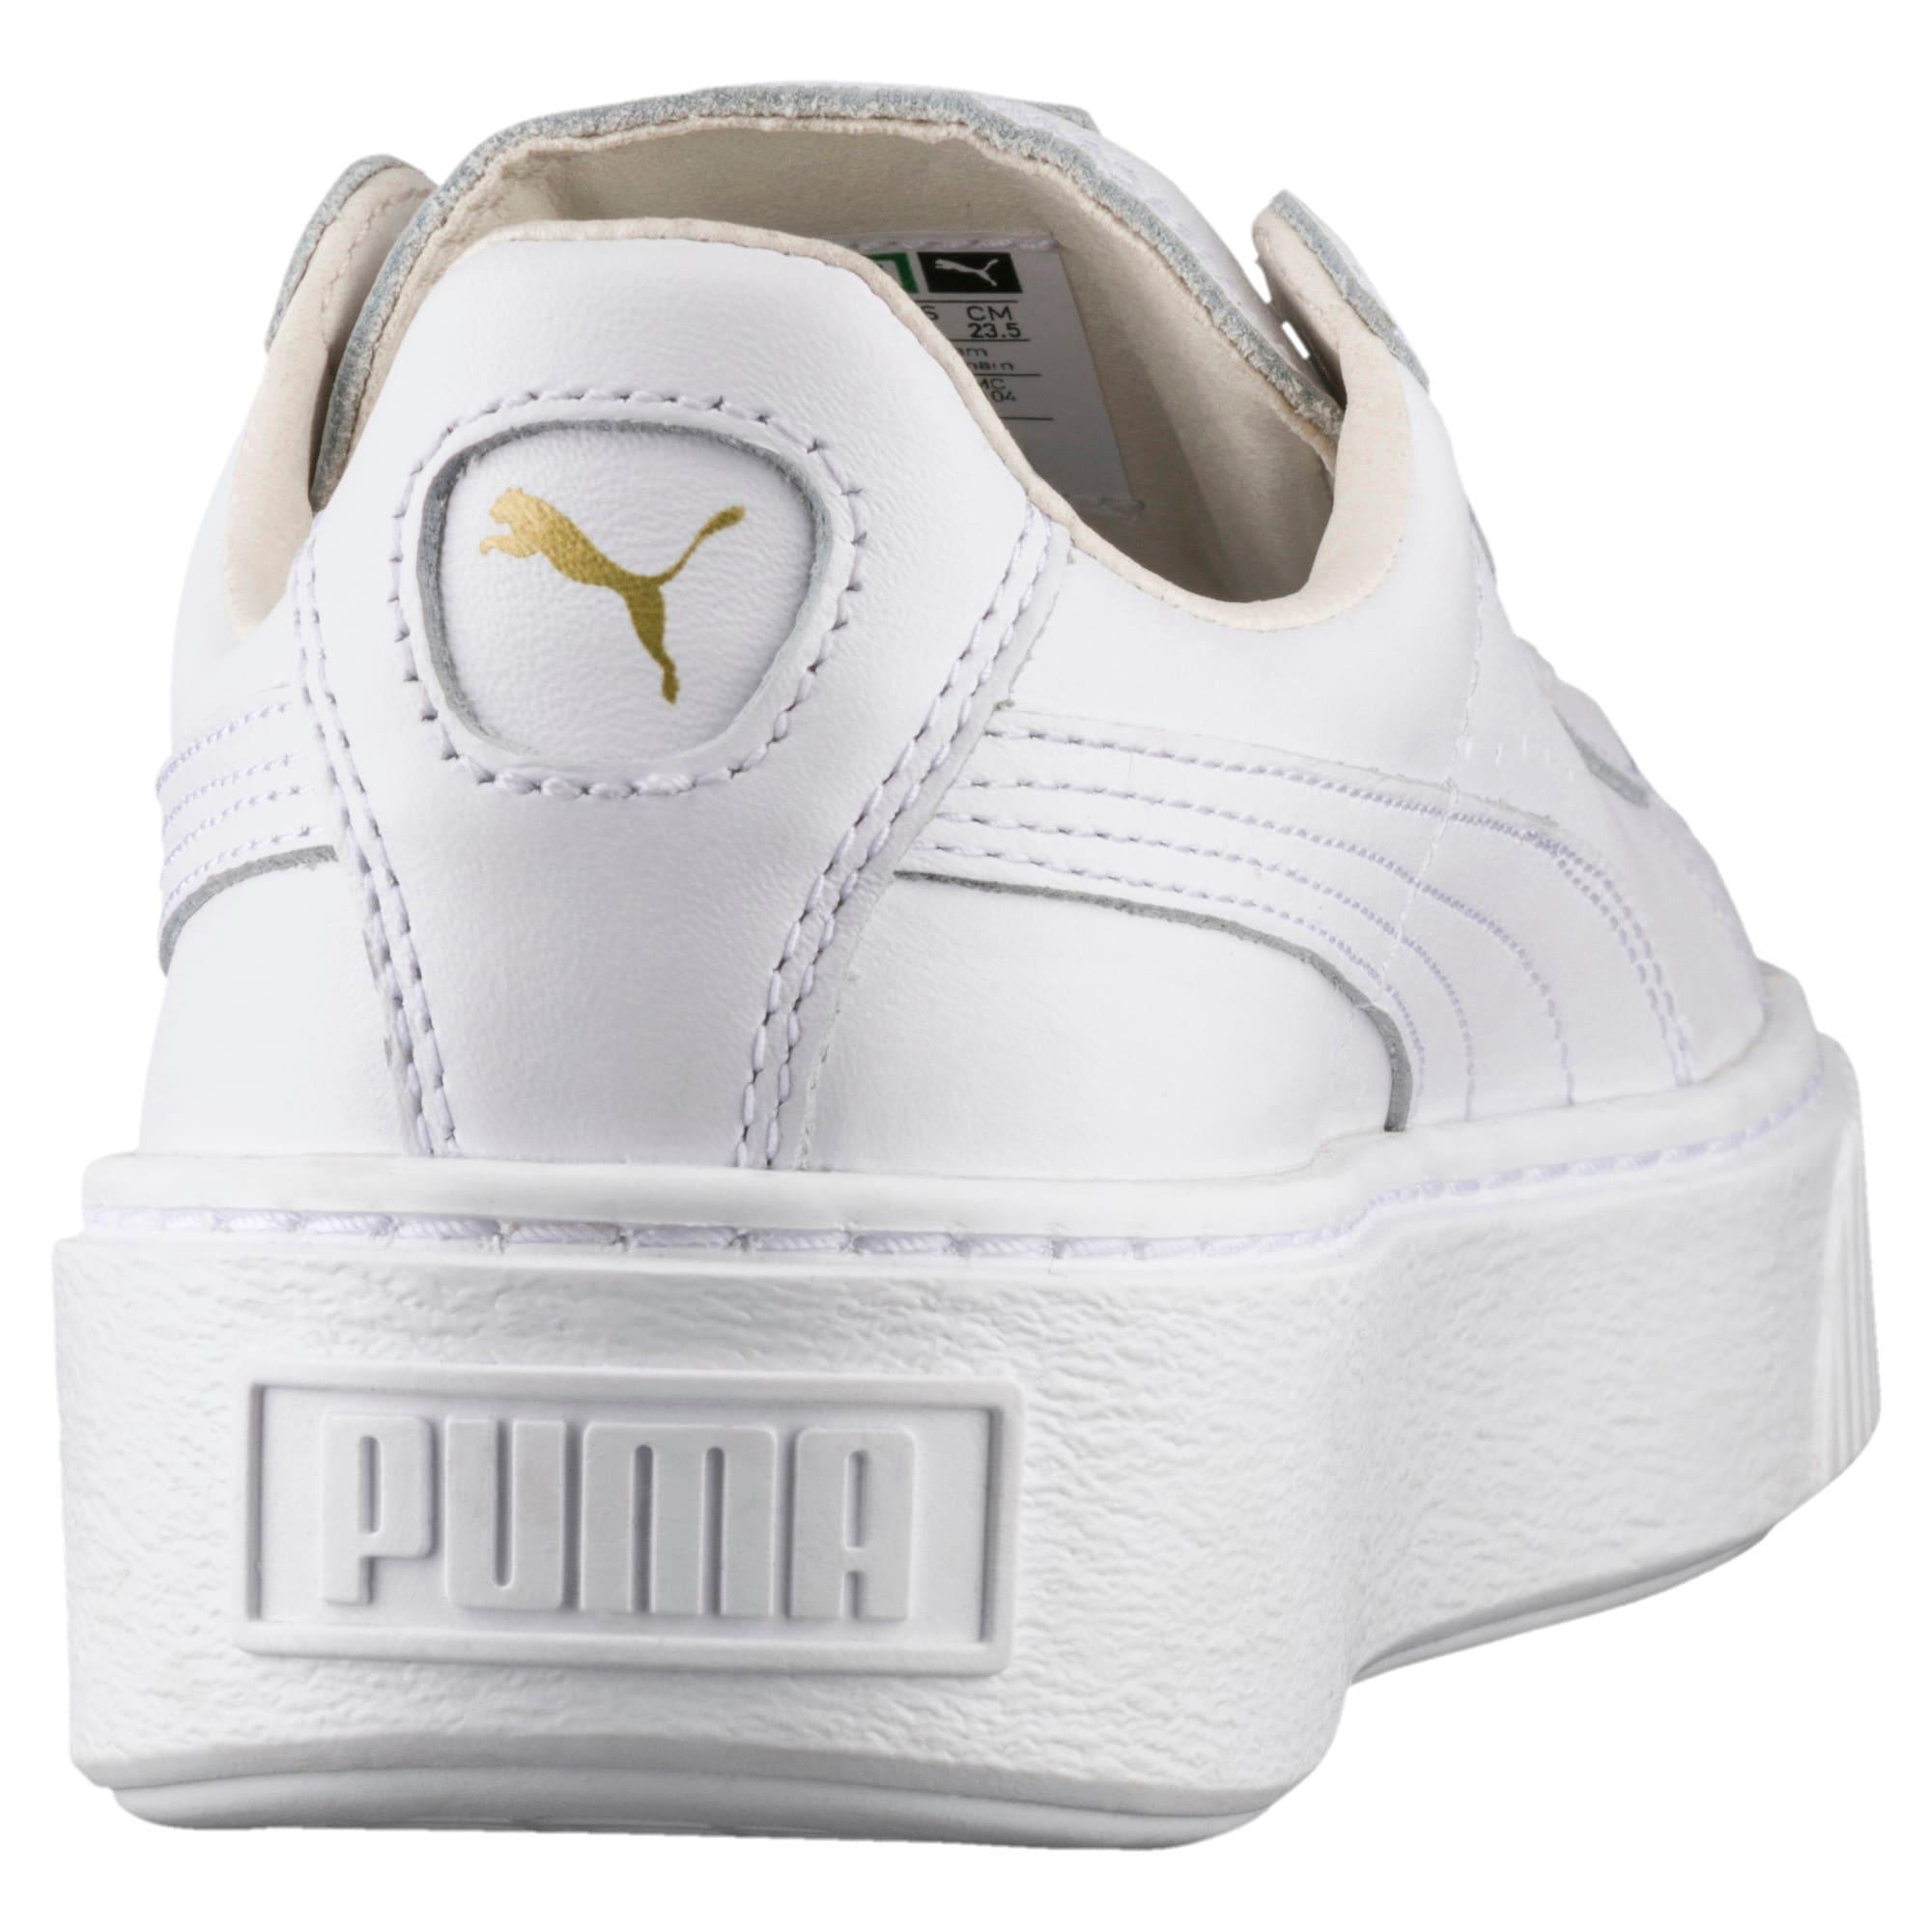 Thumbnail 4 of Basket Platform Core Women's Sneakers, Puma White-Gold, medium